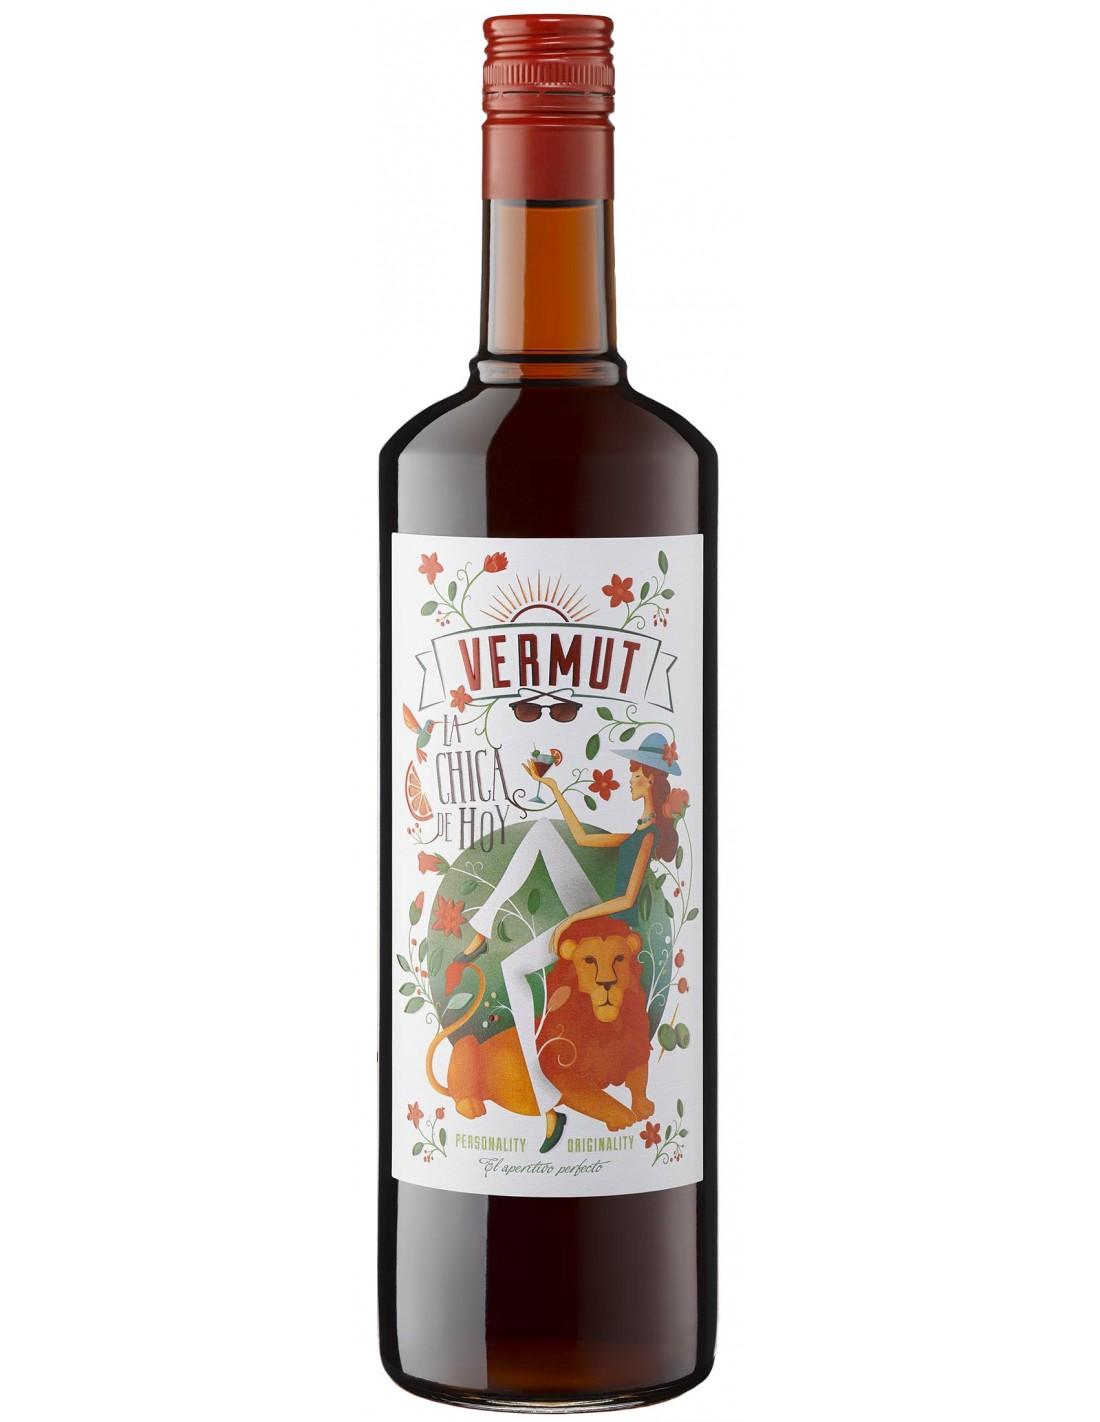 Vermut La Chica Hoy, 15% alc., 1L, Spania